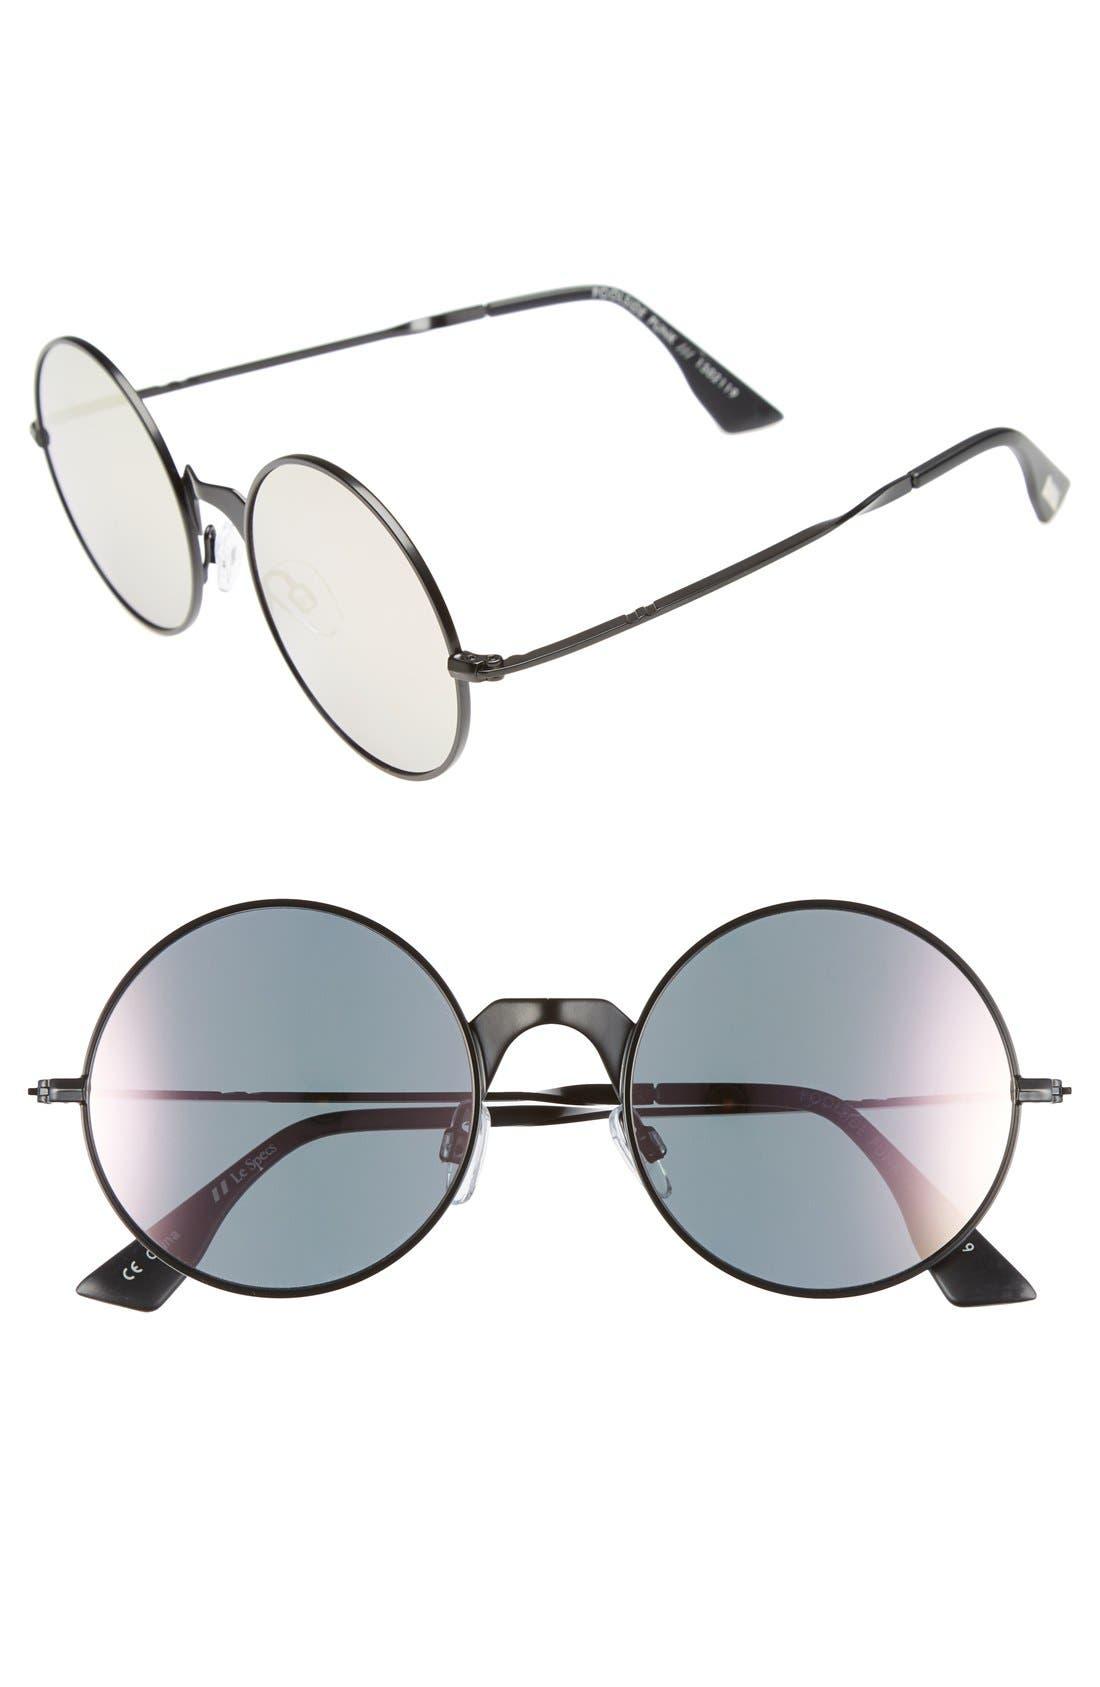 'Poolside Punk' 53mm Retro Sunglasses,                             Main thumbnail 1, color,                             001